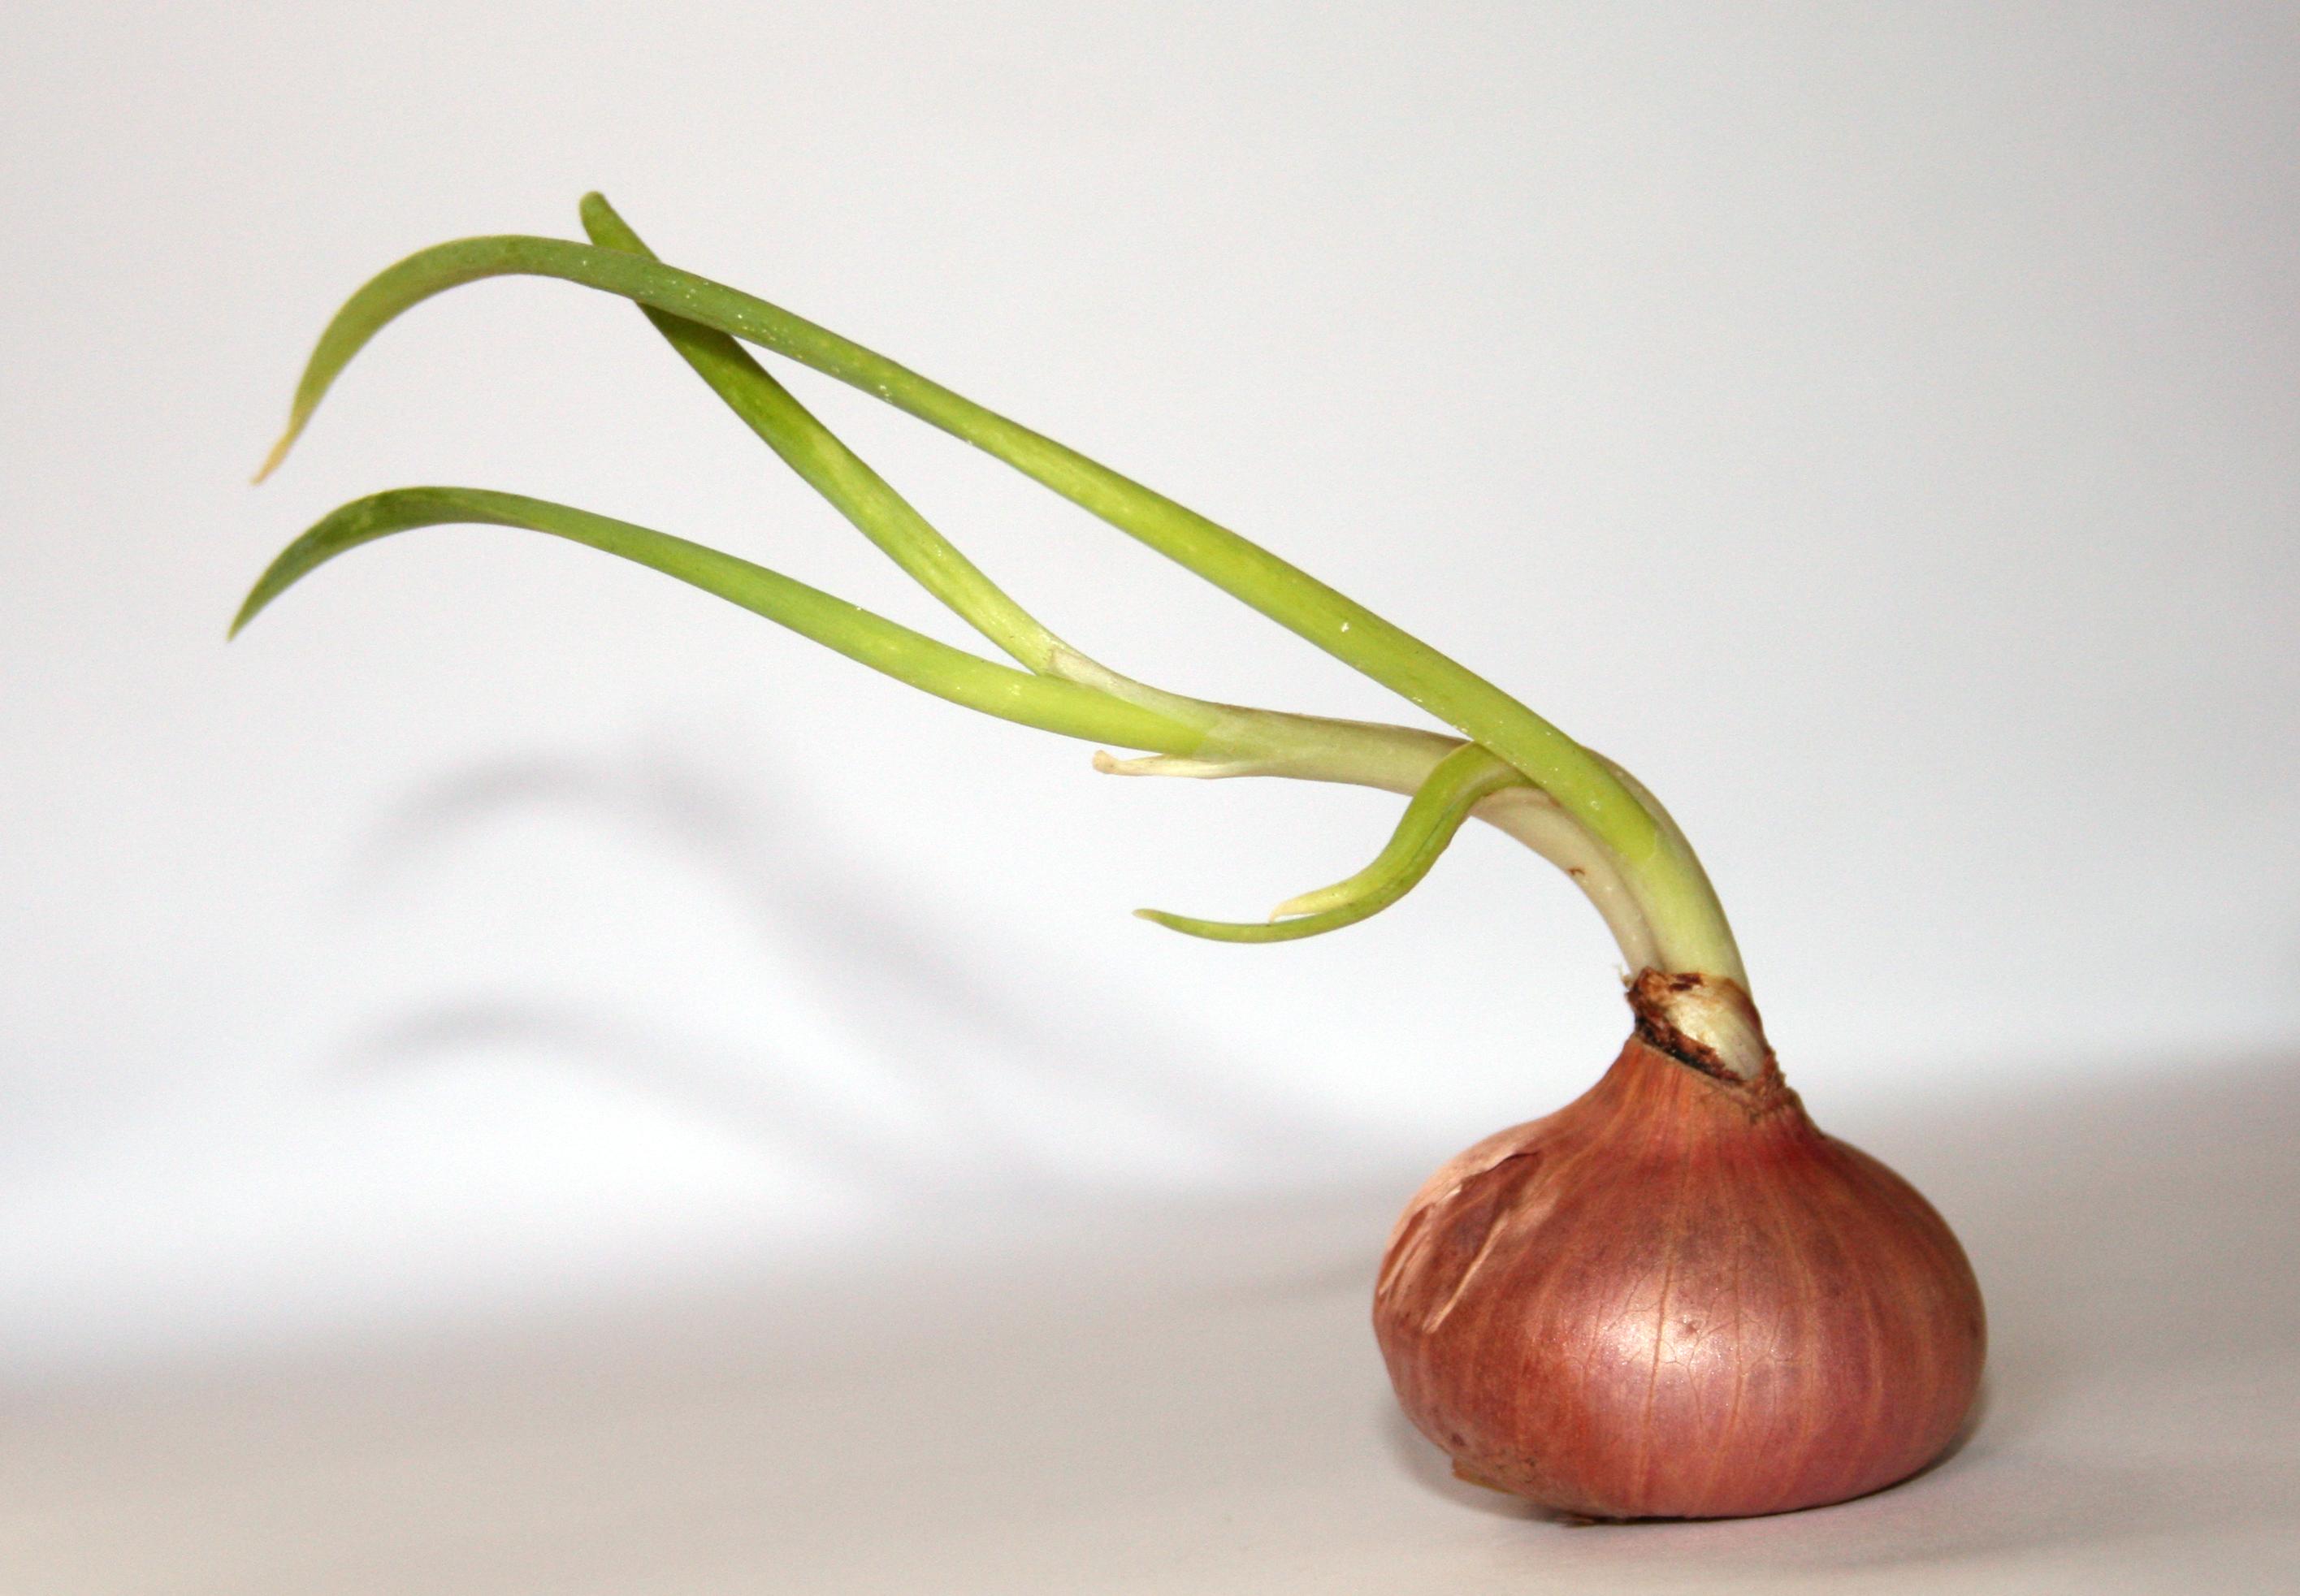 Pablo Neruda: Ode to the Onion